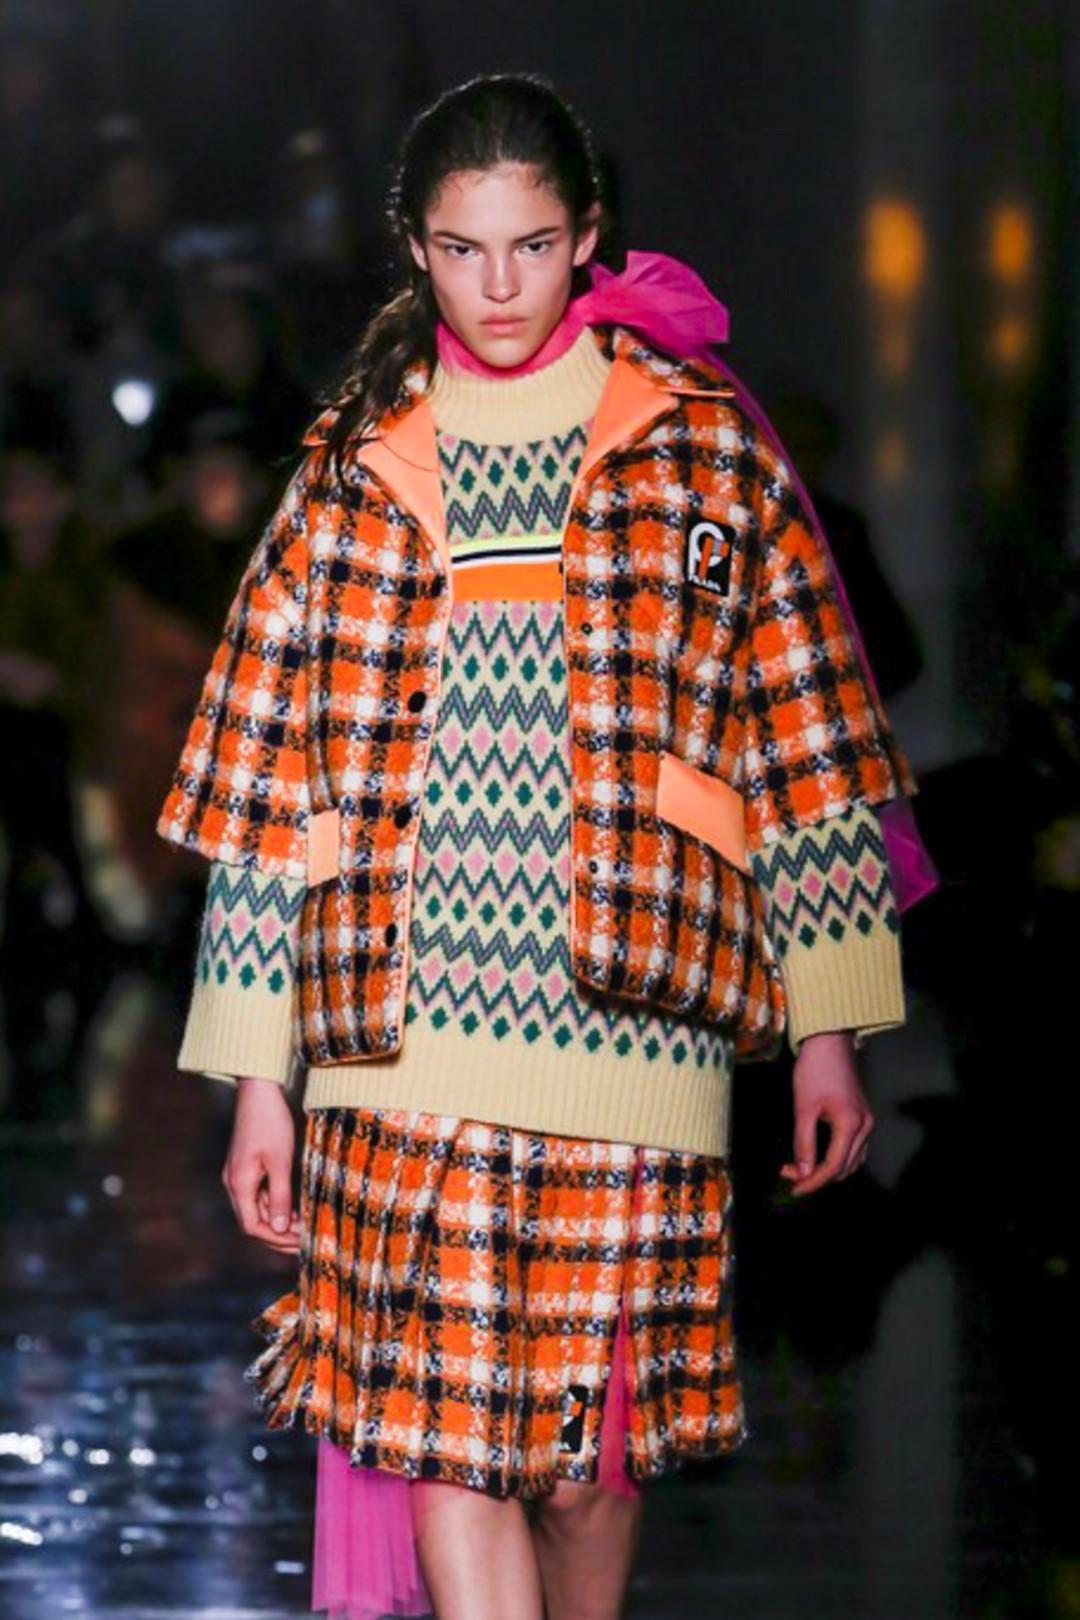 Intramontabile scozzese: come indossarlo